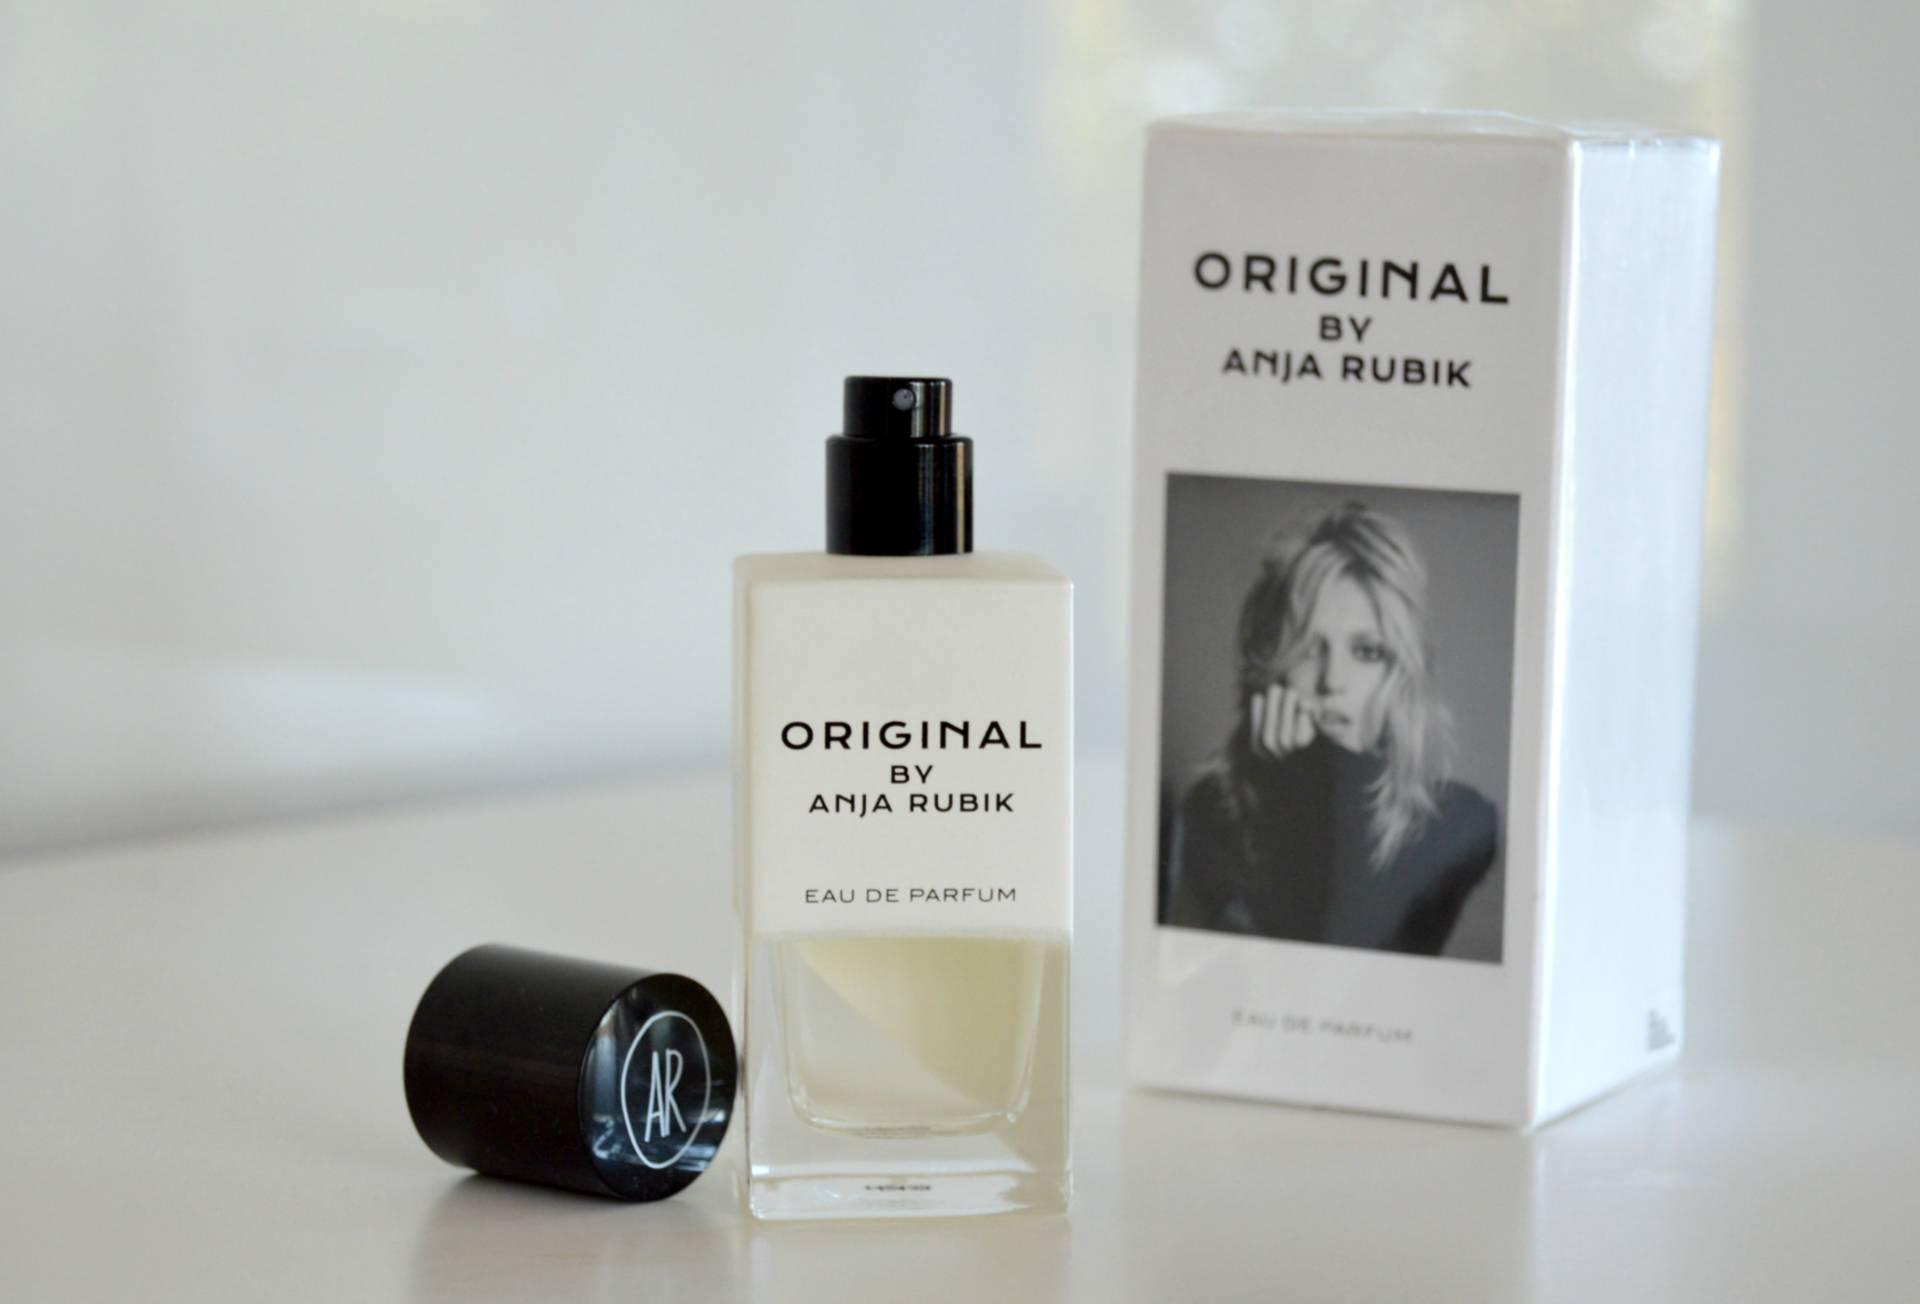 anja-rubik-original-fragrance-poland-shopping-review-inhautepursuit-inglot